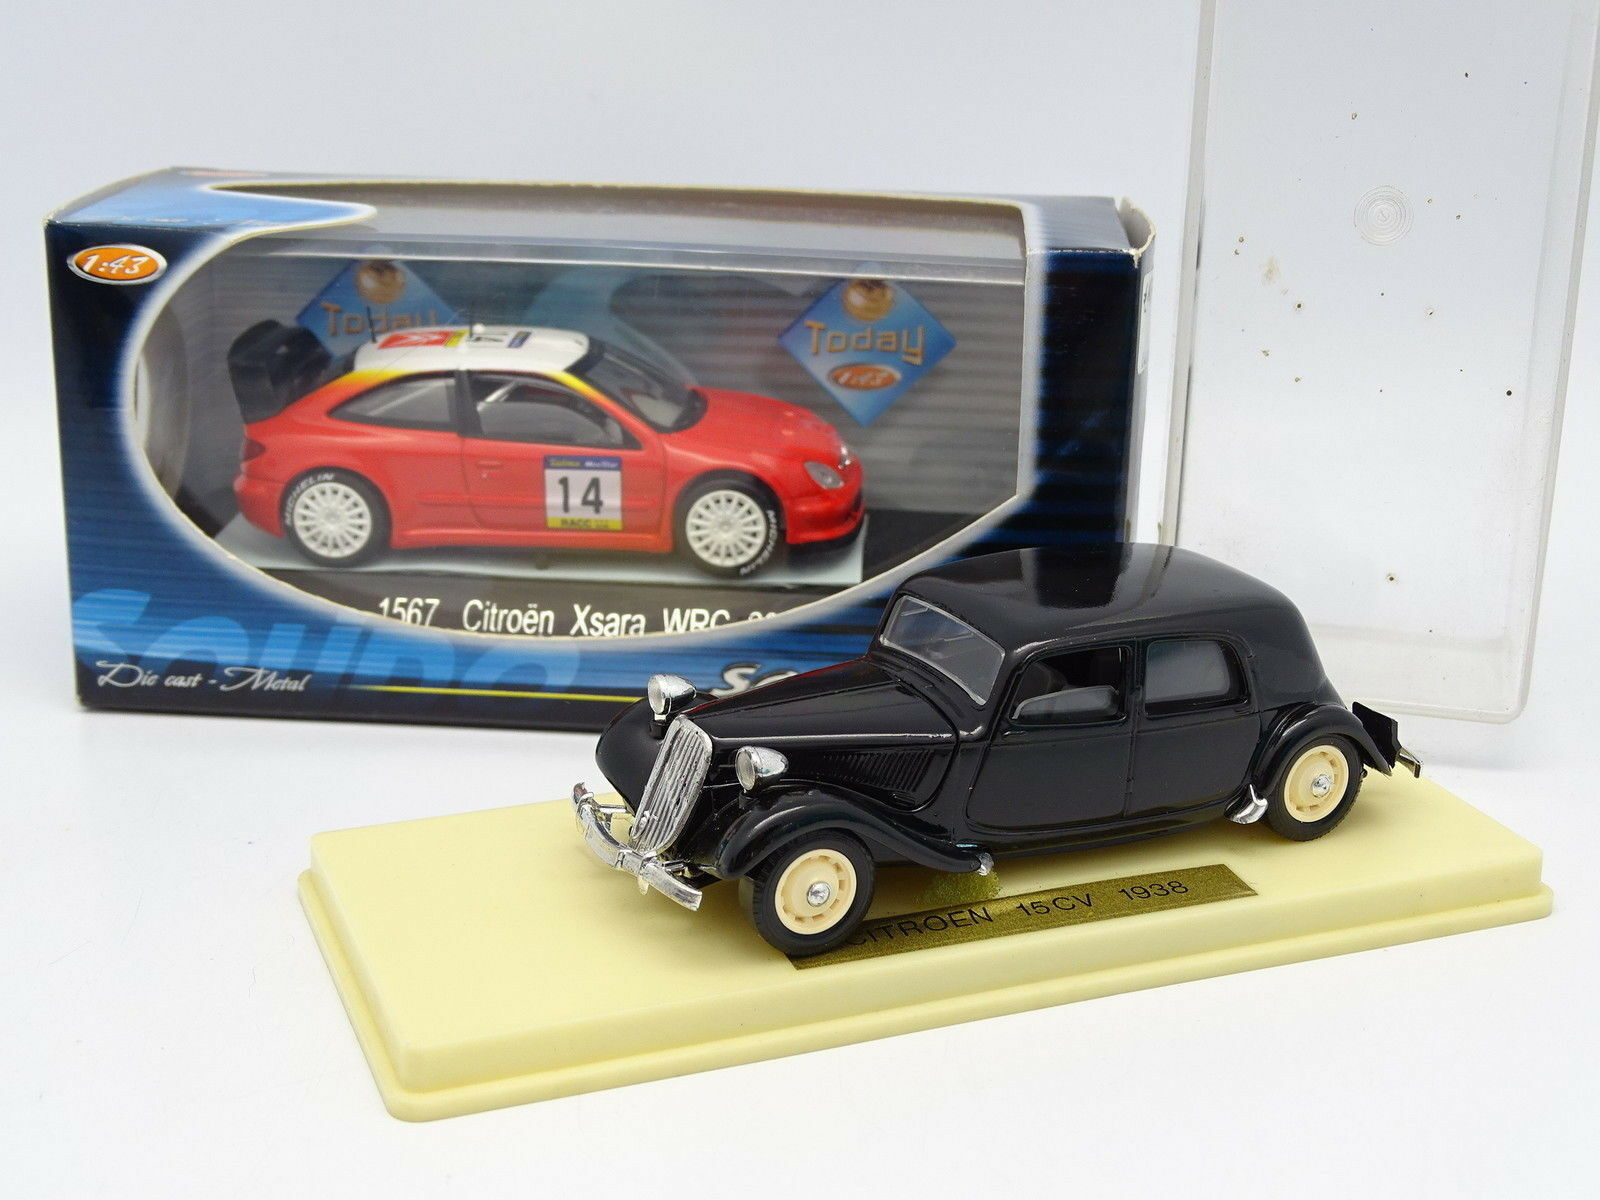 Solido 1 43 - 2er Satz Satz Satz  Citroen Xsara WRC & Citroen Traction cb81af